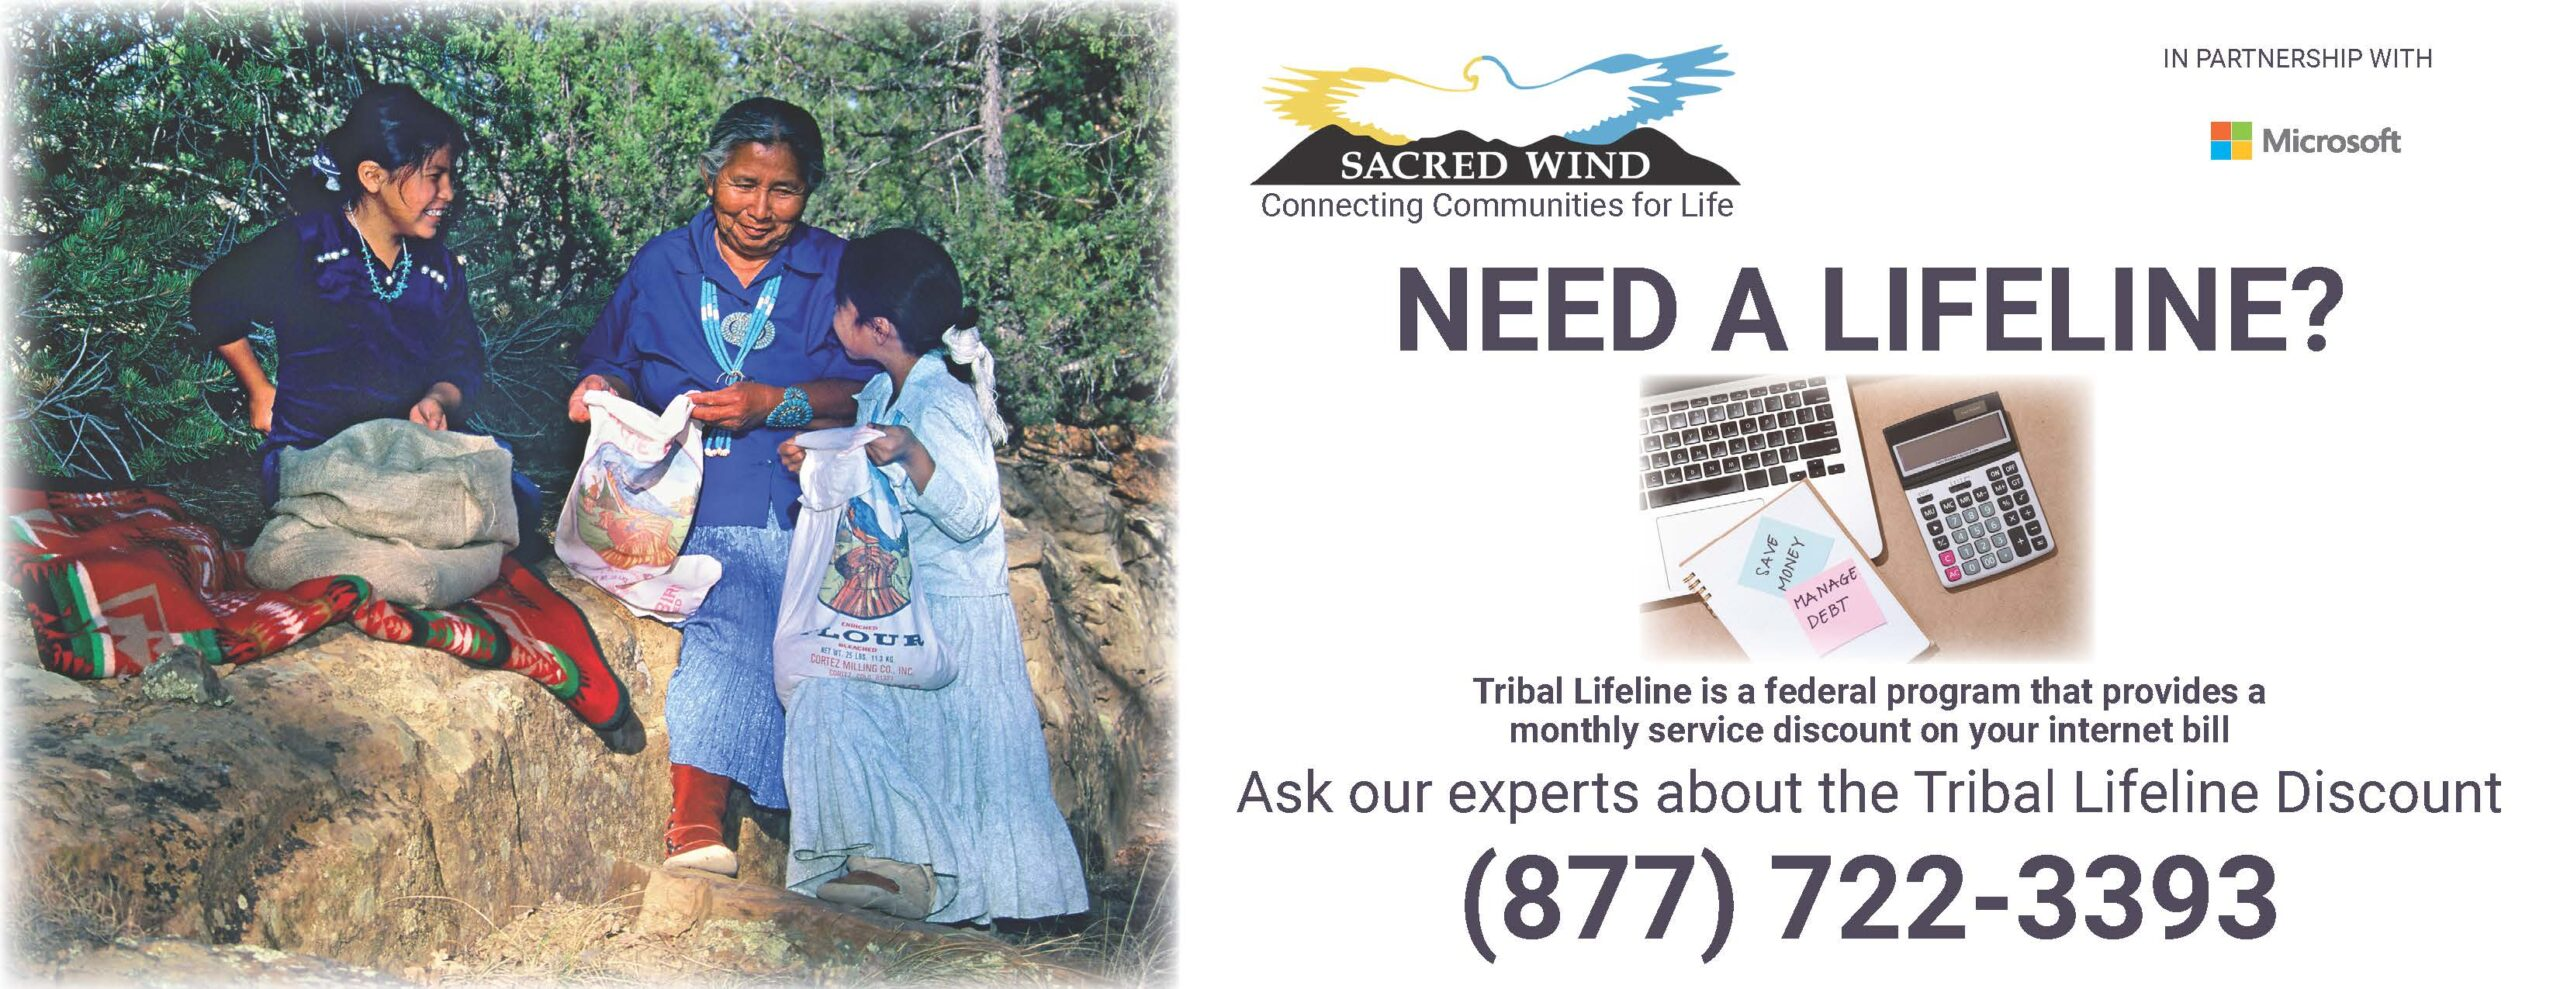 Sacred-Wind-Tribal-Lifeline-Handout.4.25x11.11.14.19_Page_1-1